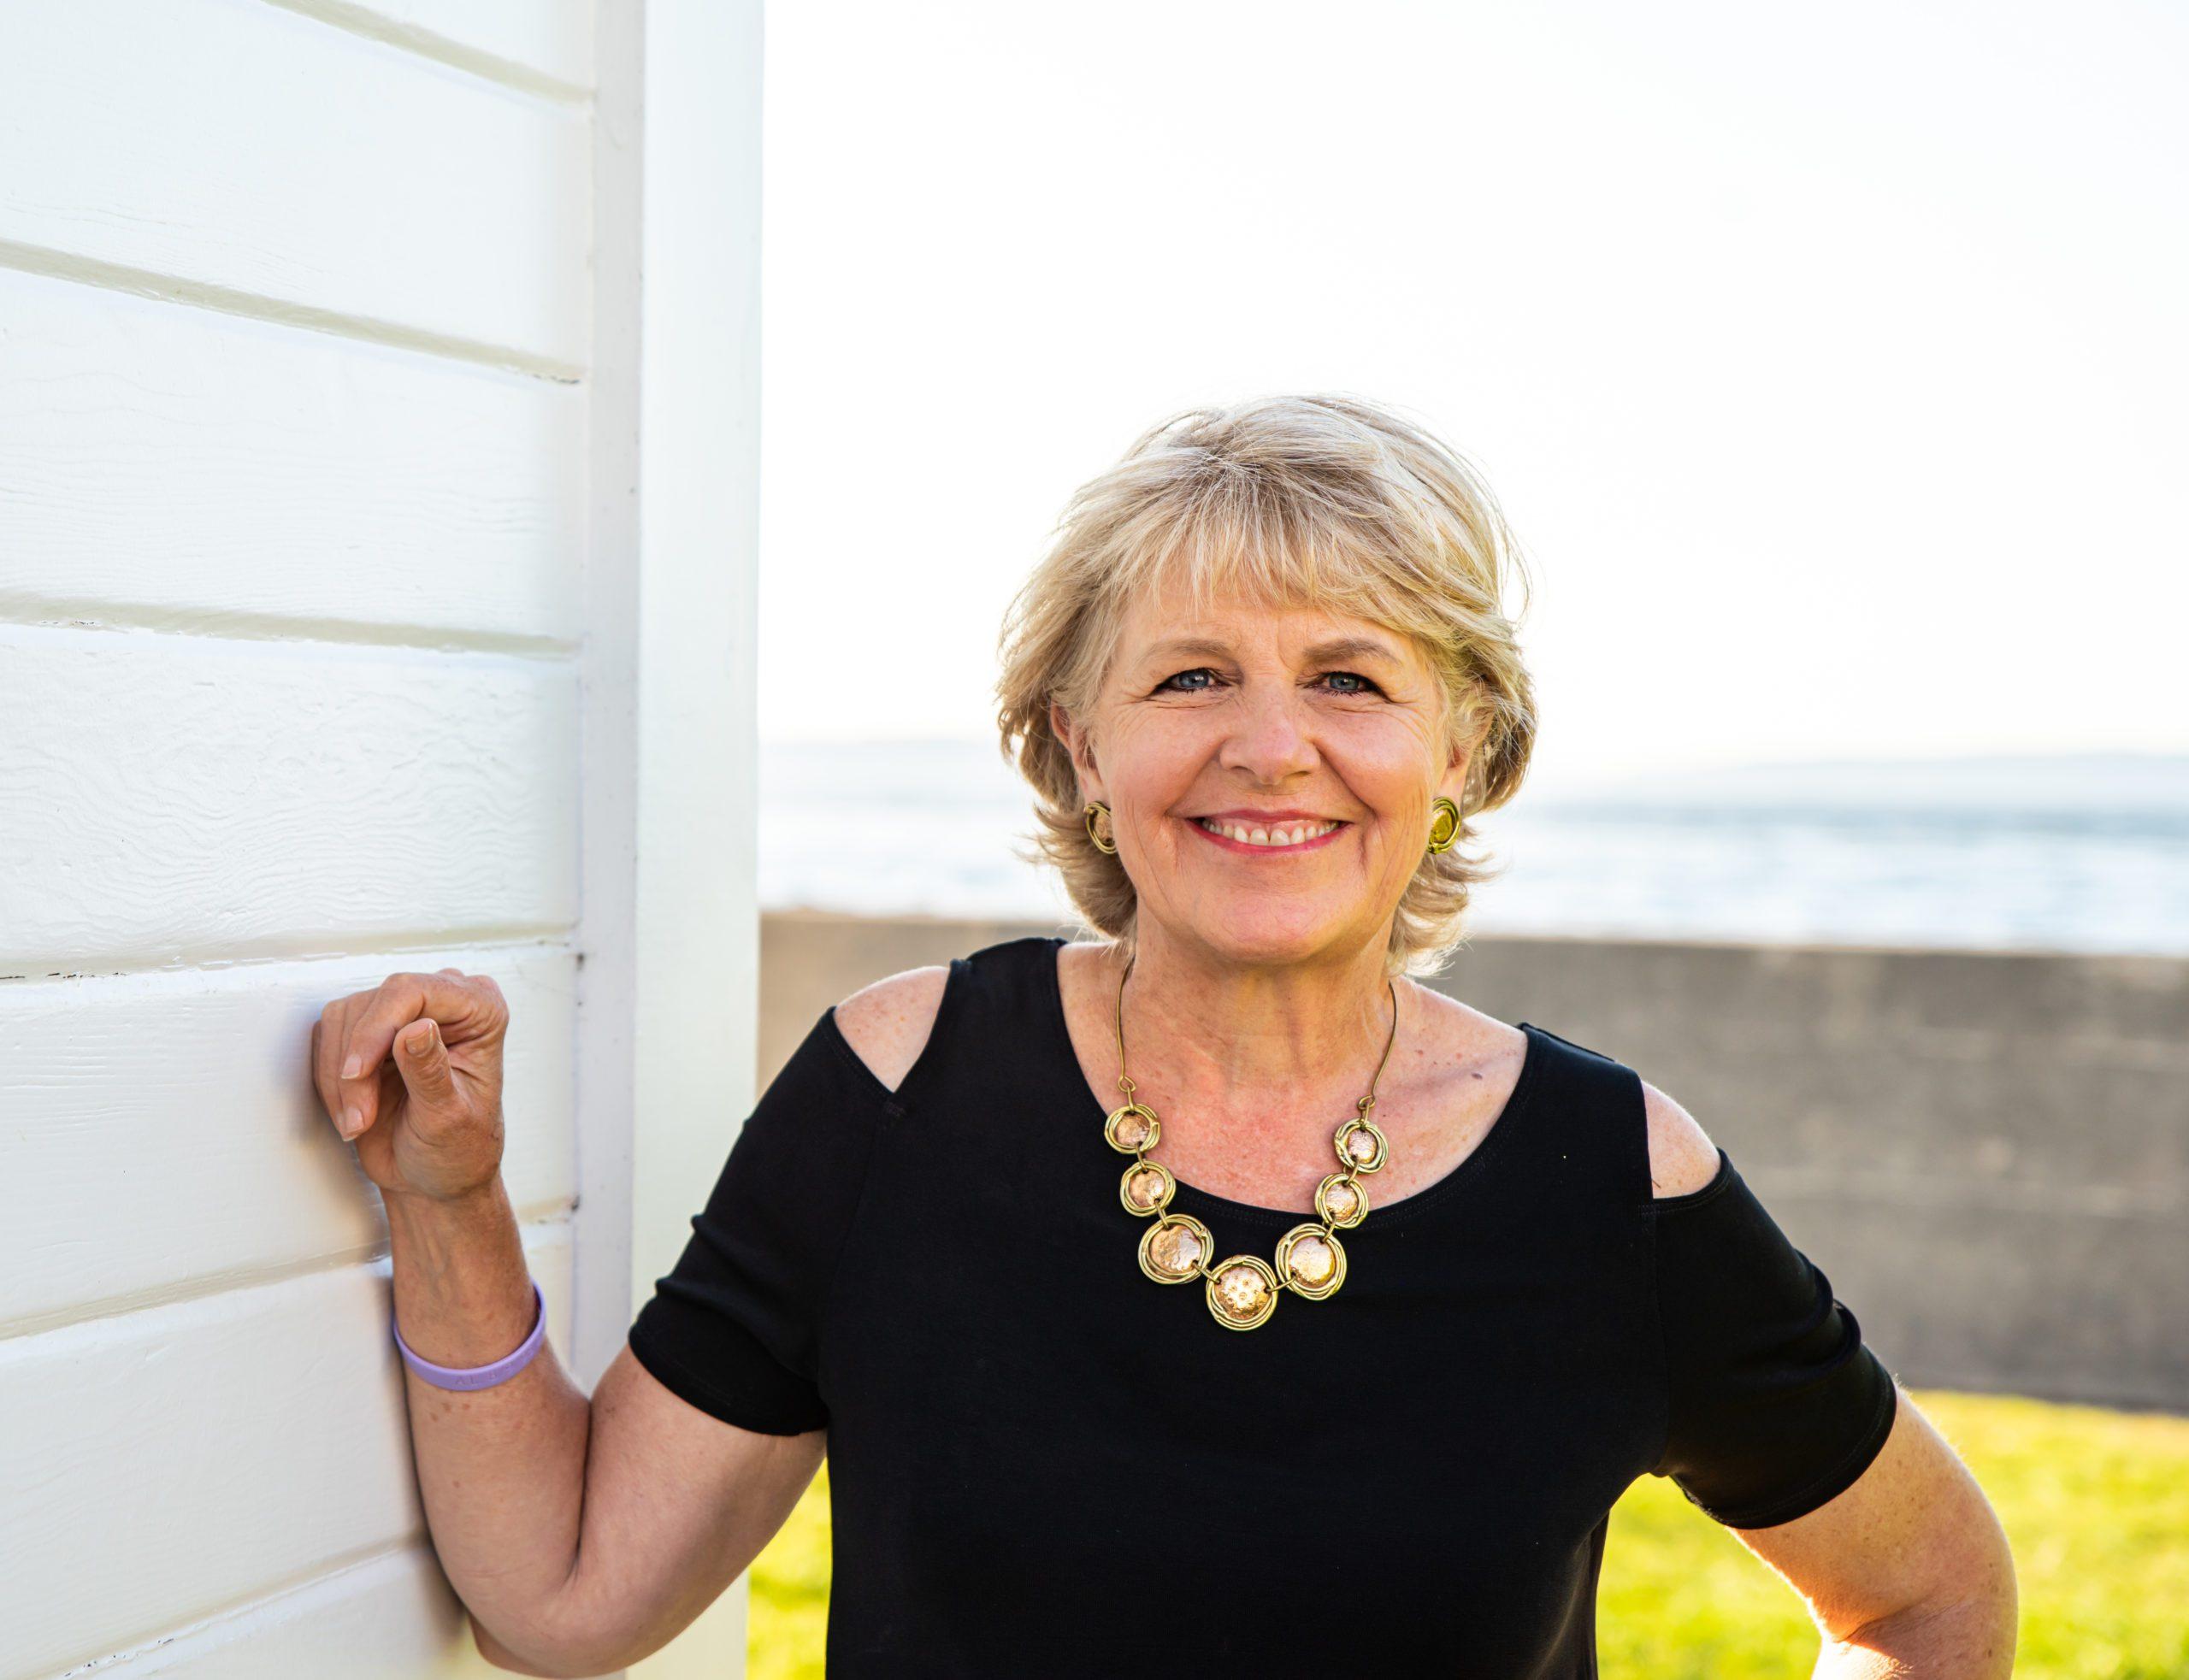 Maureen Kures